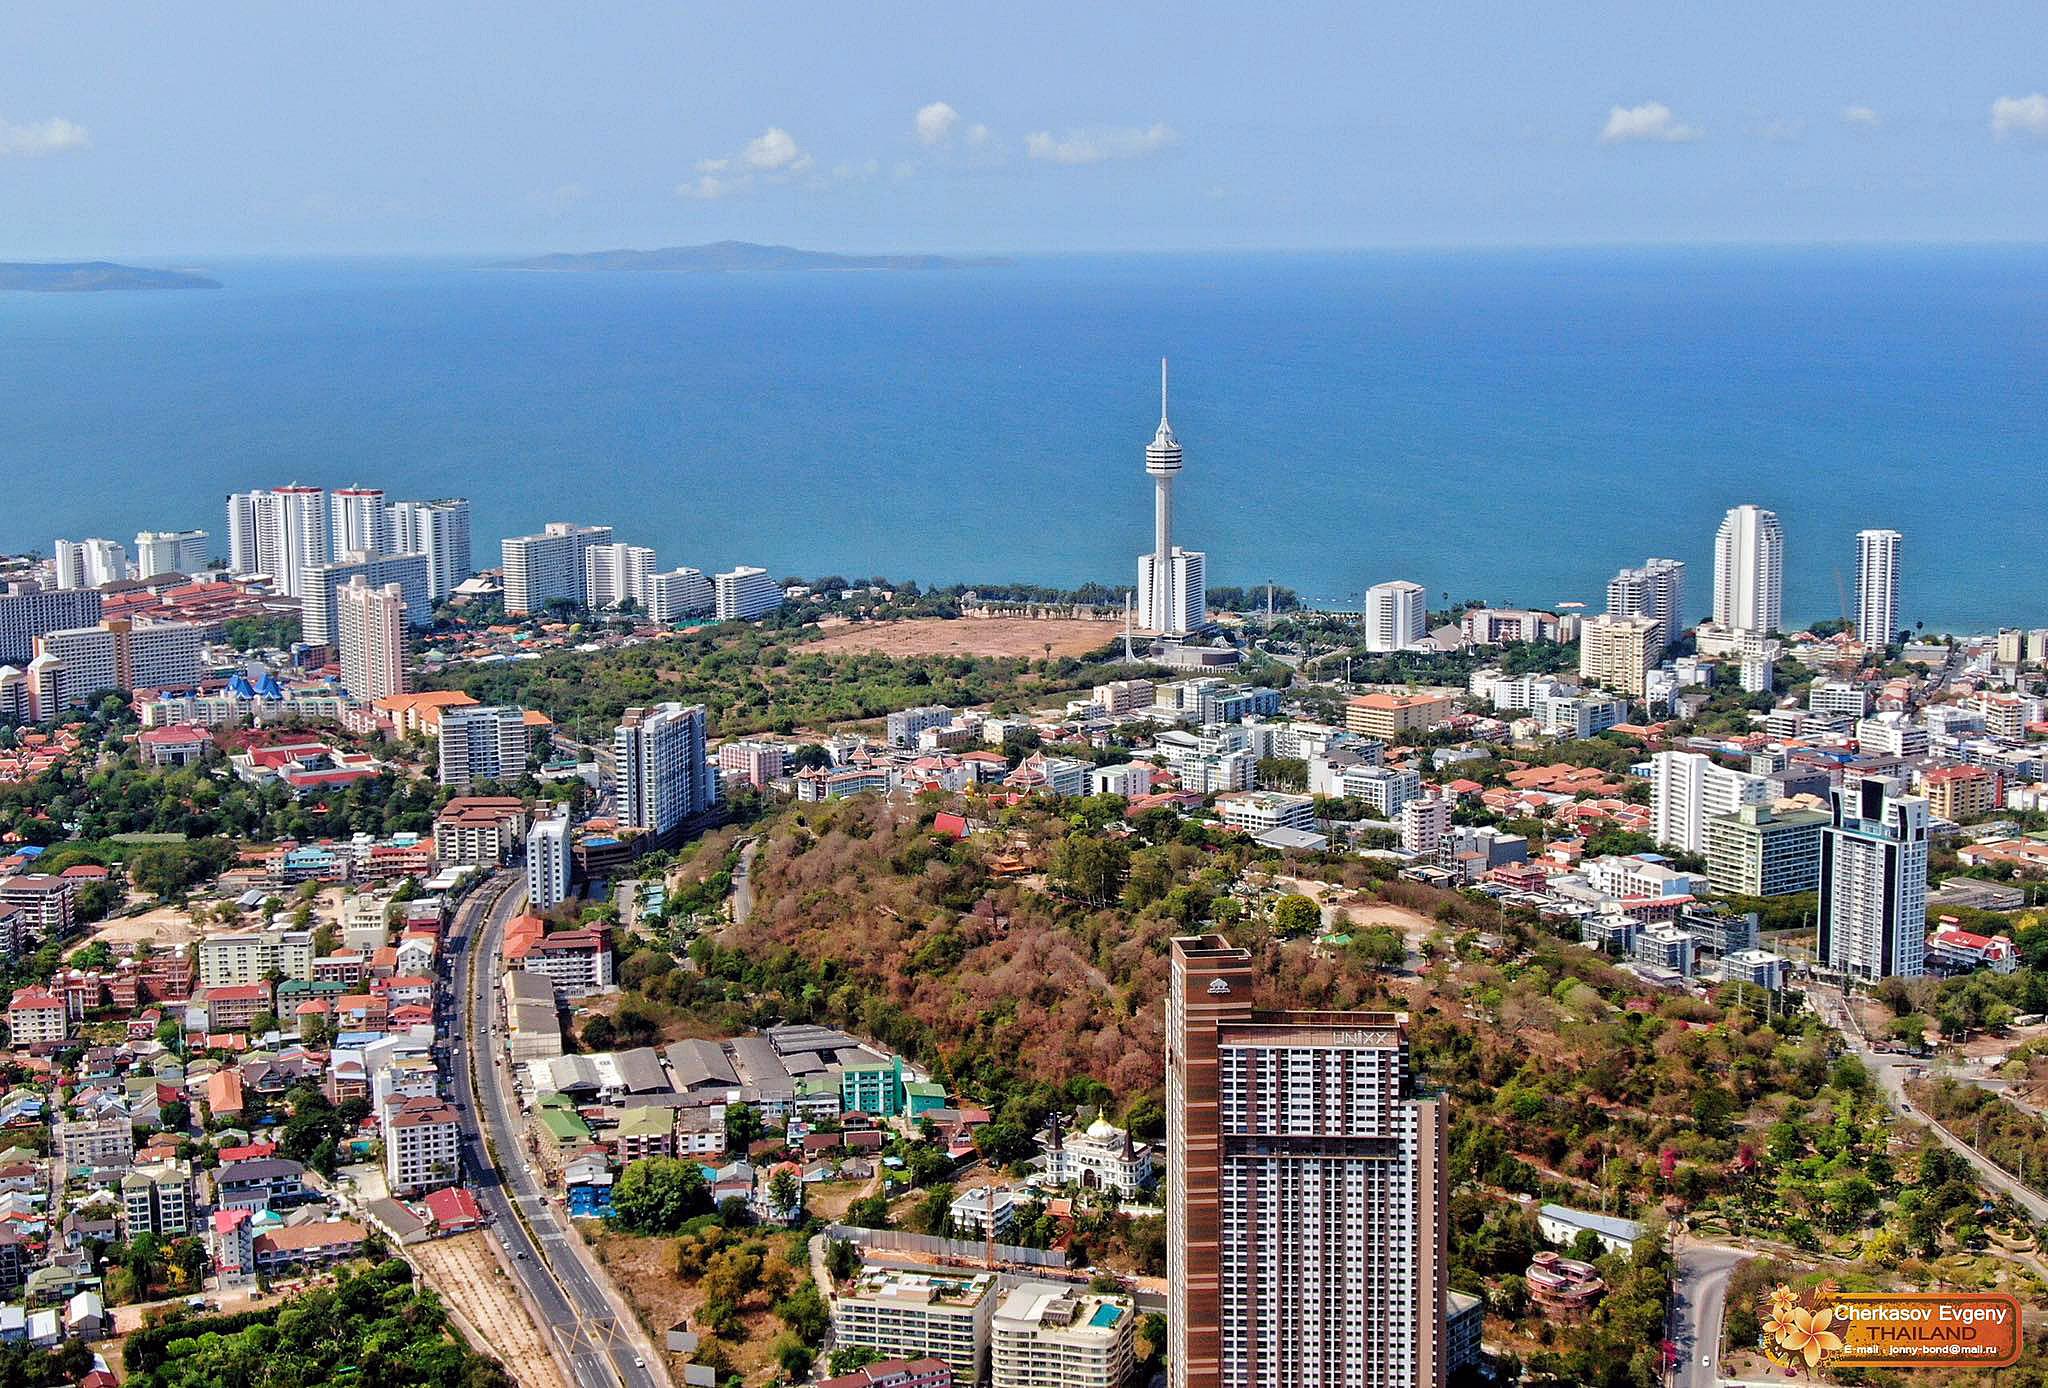 Pattaya by E Cherkasov 02.jpg